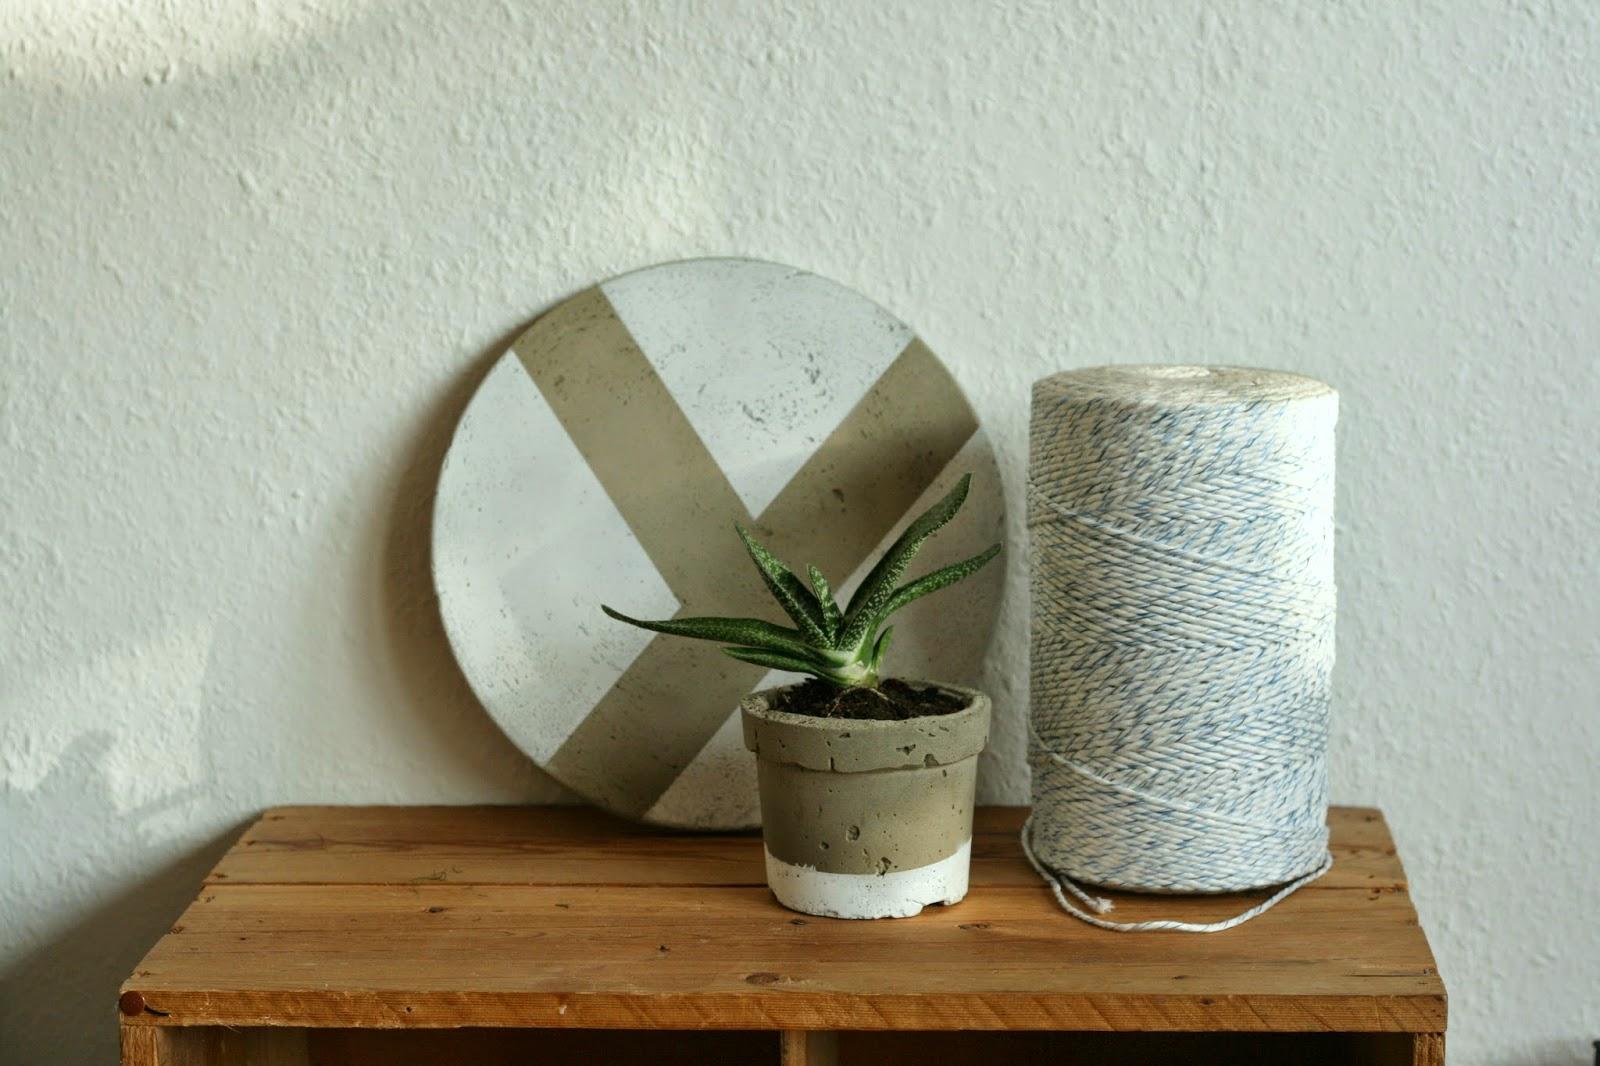 vida nullvier blumentopf aus beton. Black Bedroom Furniture Sets. Home Design Ideas